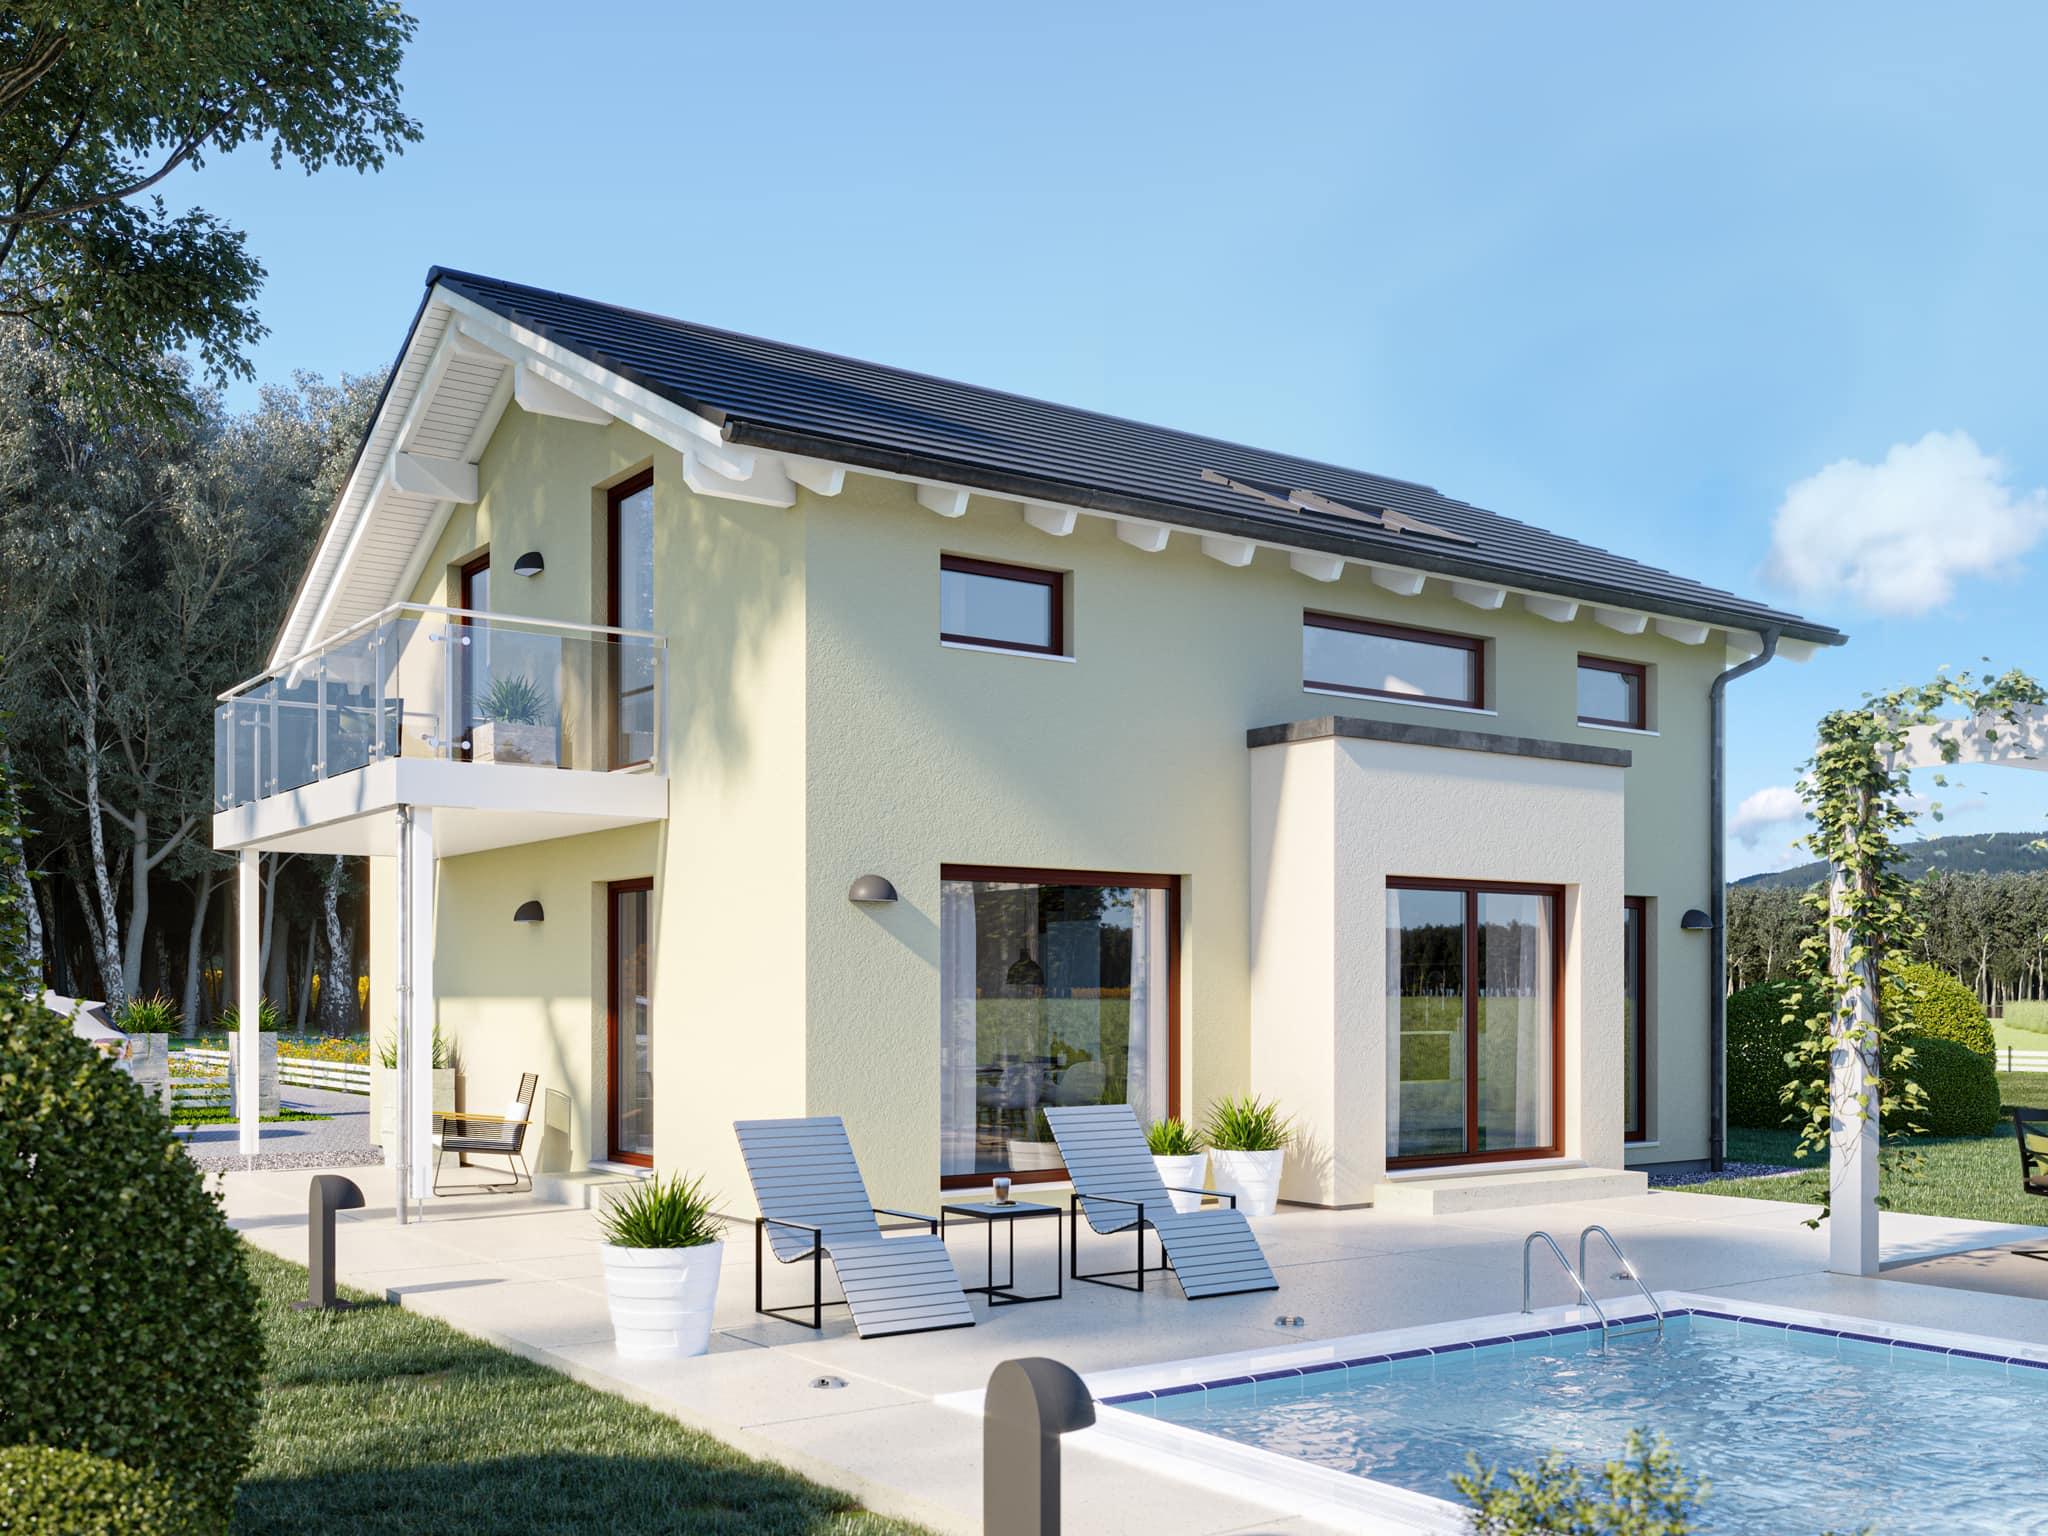 Einfamilienhaus Neubau mit Satteldach, Erker & Balkon, 4 Zimmer, 130 qm - Haus bauen Ideen Bien Zenker Fertighaus EDITION 134 V4 - HausbauDirekt.de